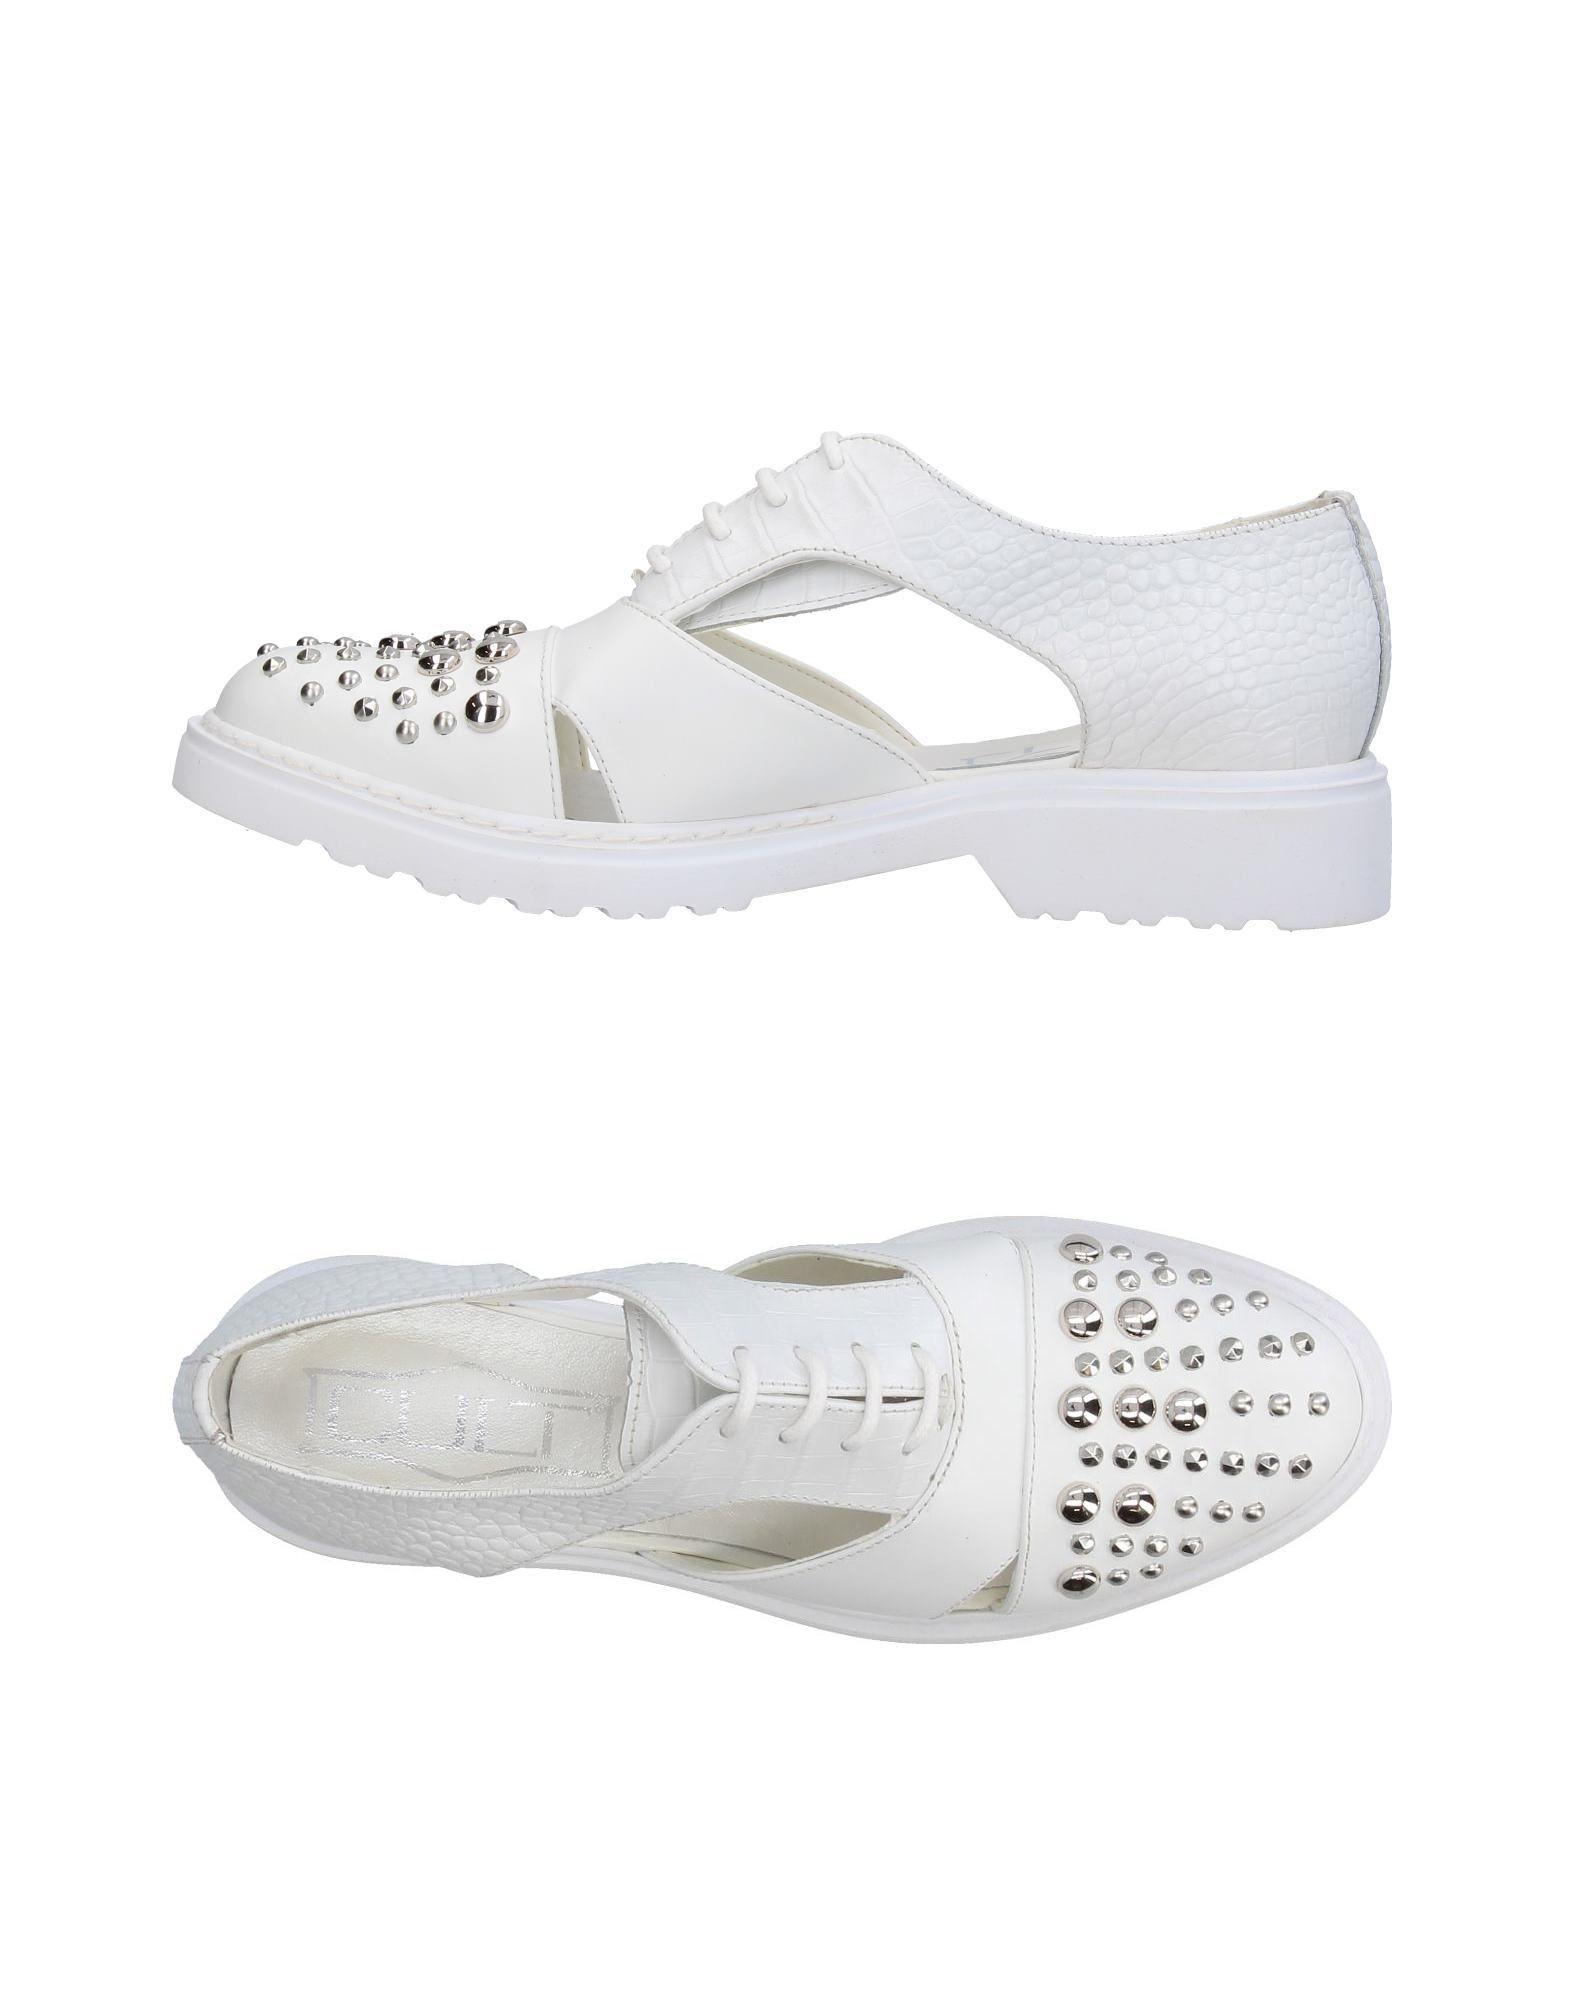 Cult Schnürschuhe Damen  11378446EB Gute Qualität beliebte Schuhe